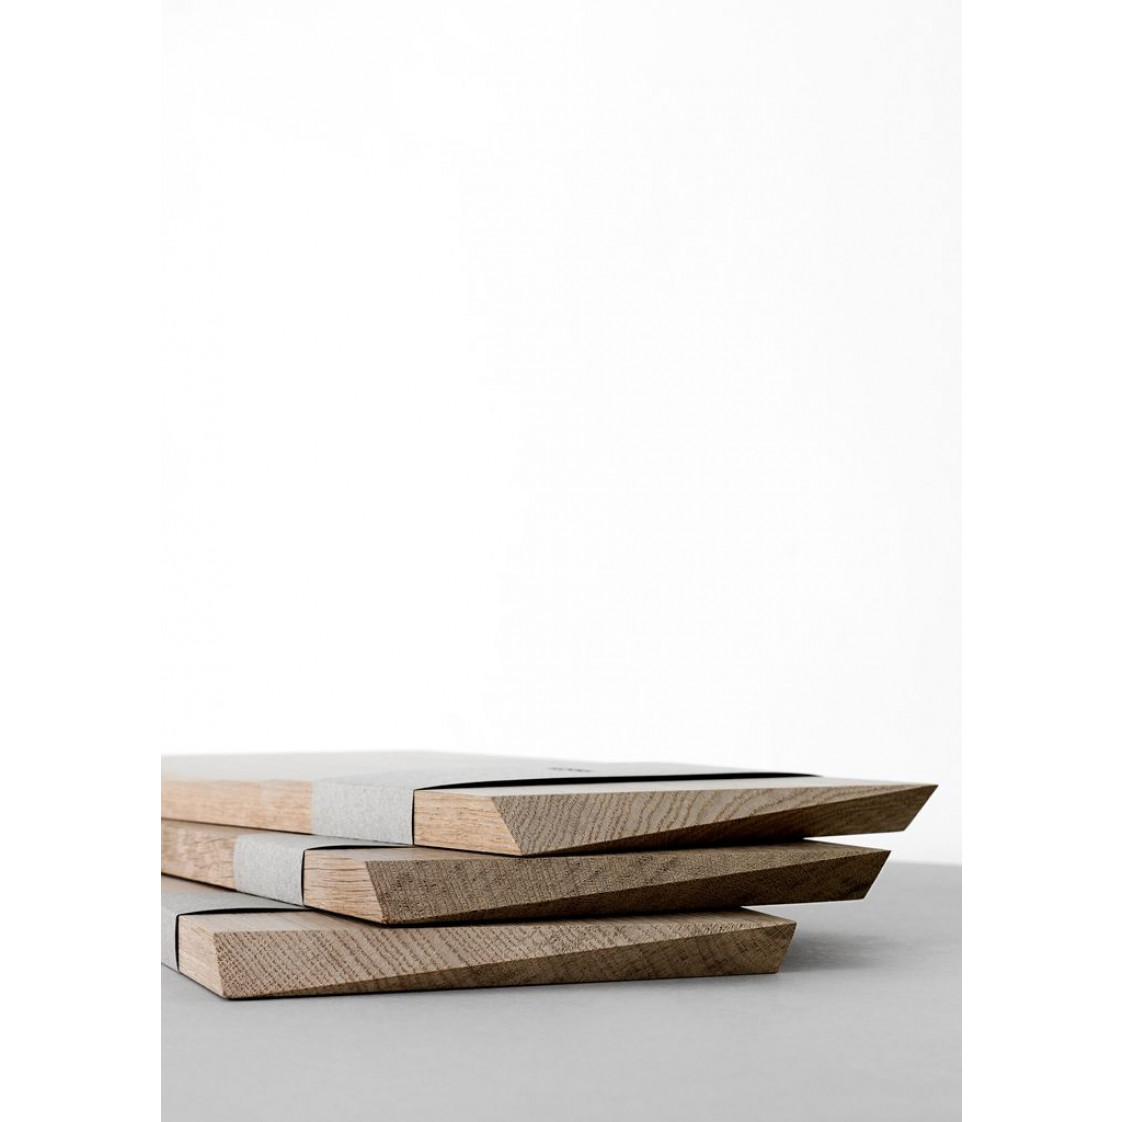 Piece of Wood Cutting Board